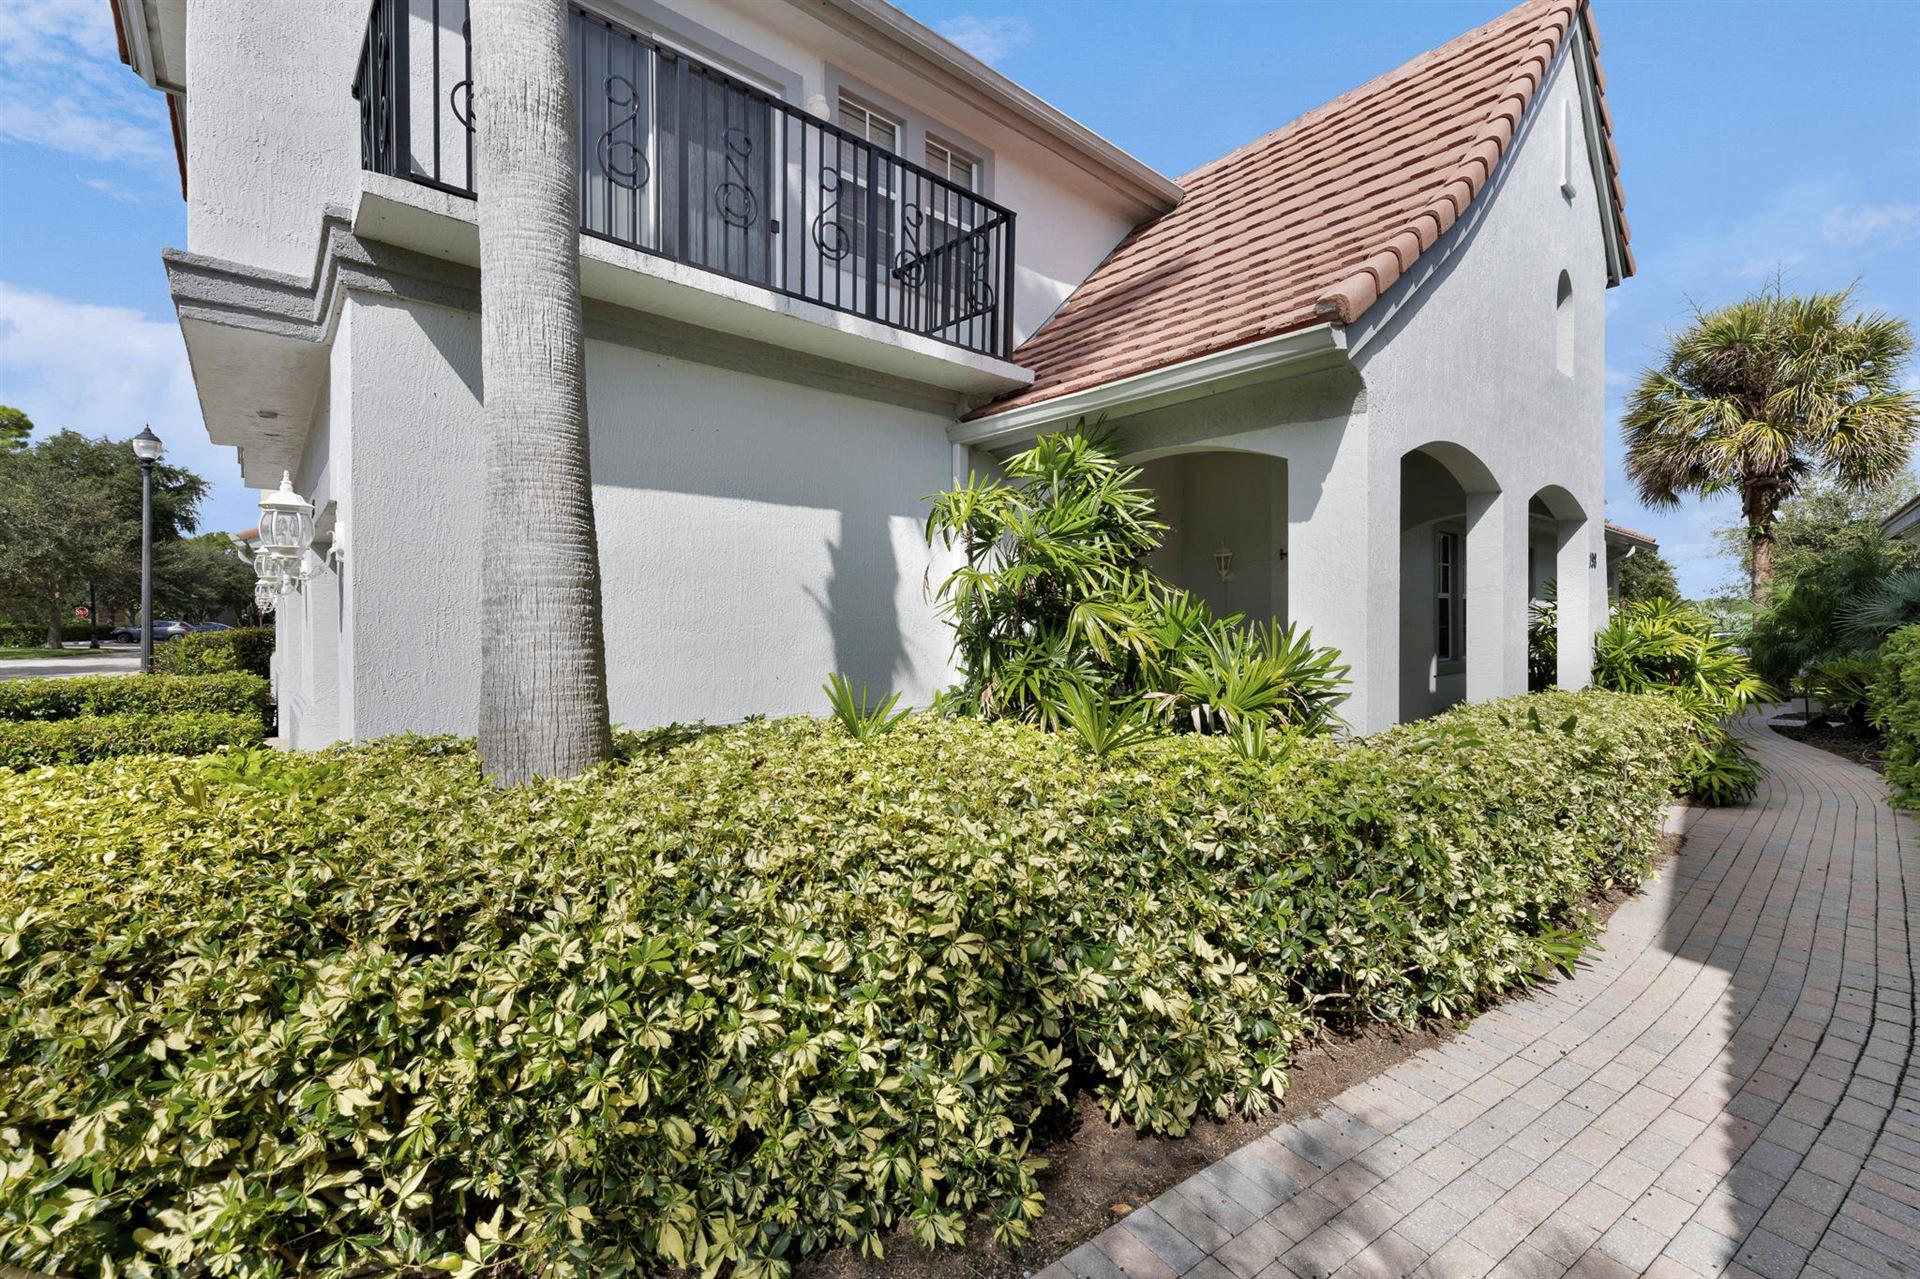 Photo of 198 Evergrene Parkway #198, Palm Beach Gardens, FL 33410 (MLS # RX-10671456)